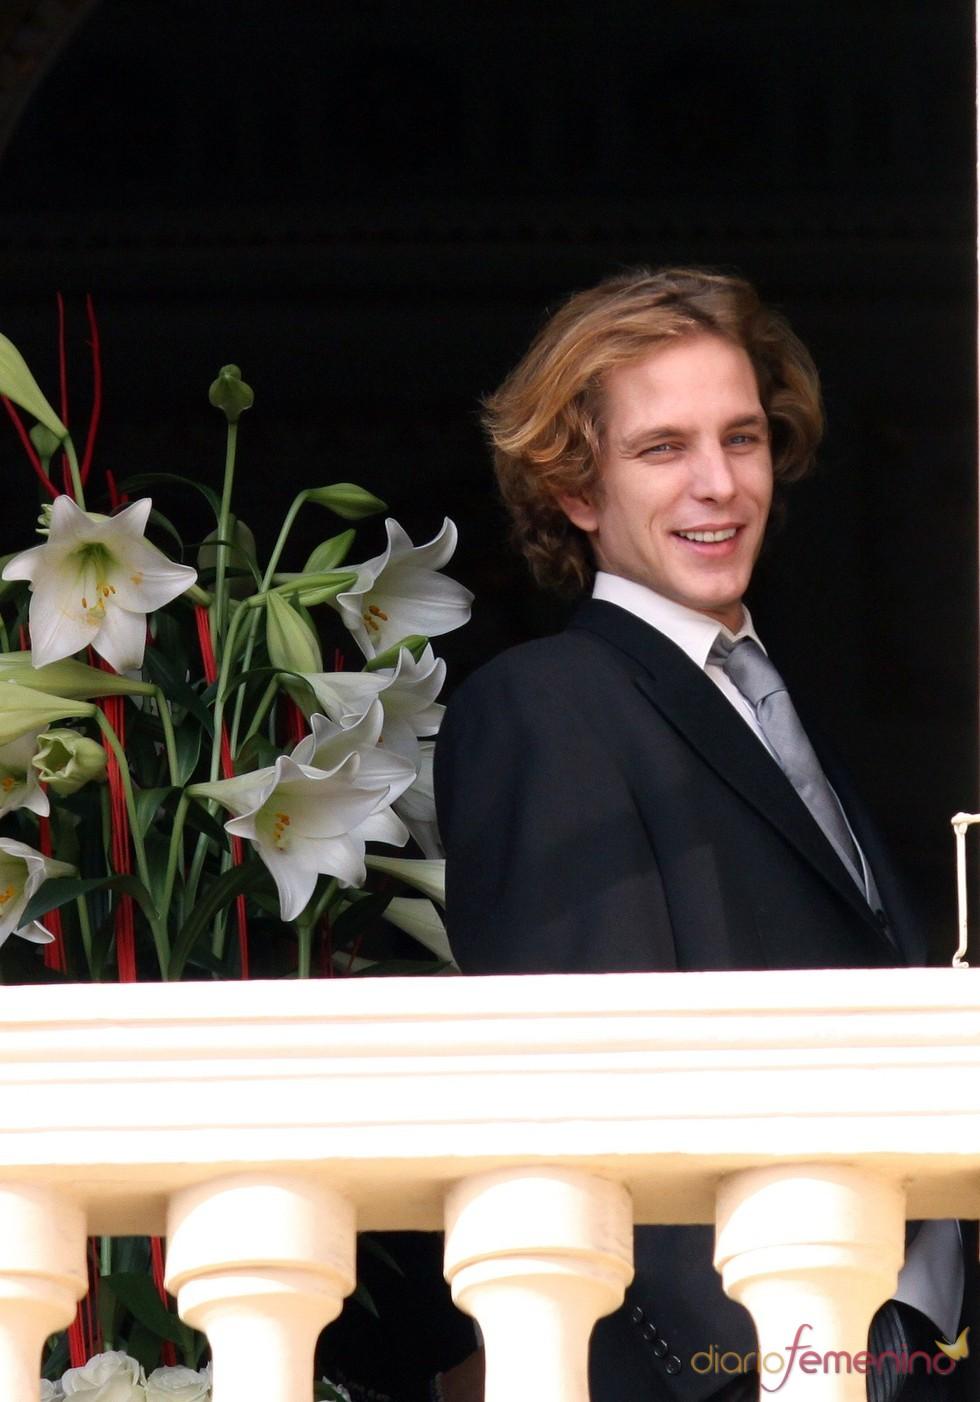 El Príncipe Andrea Casiraghi de Mónaco